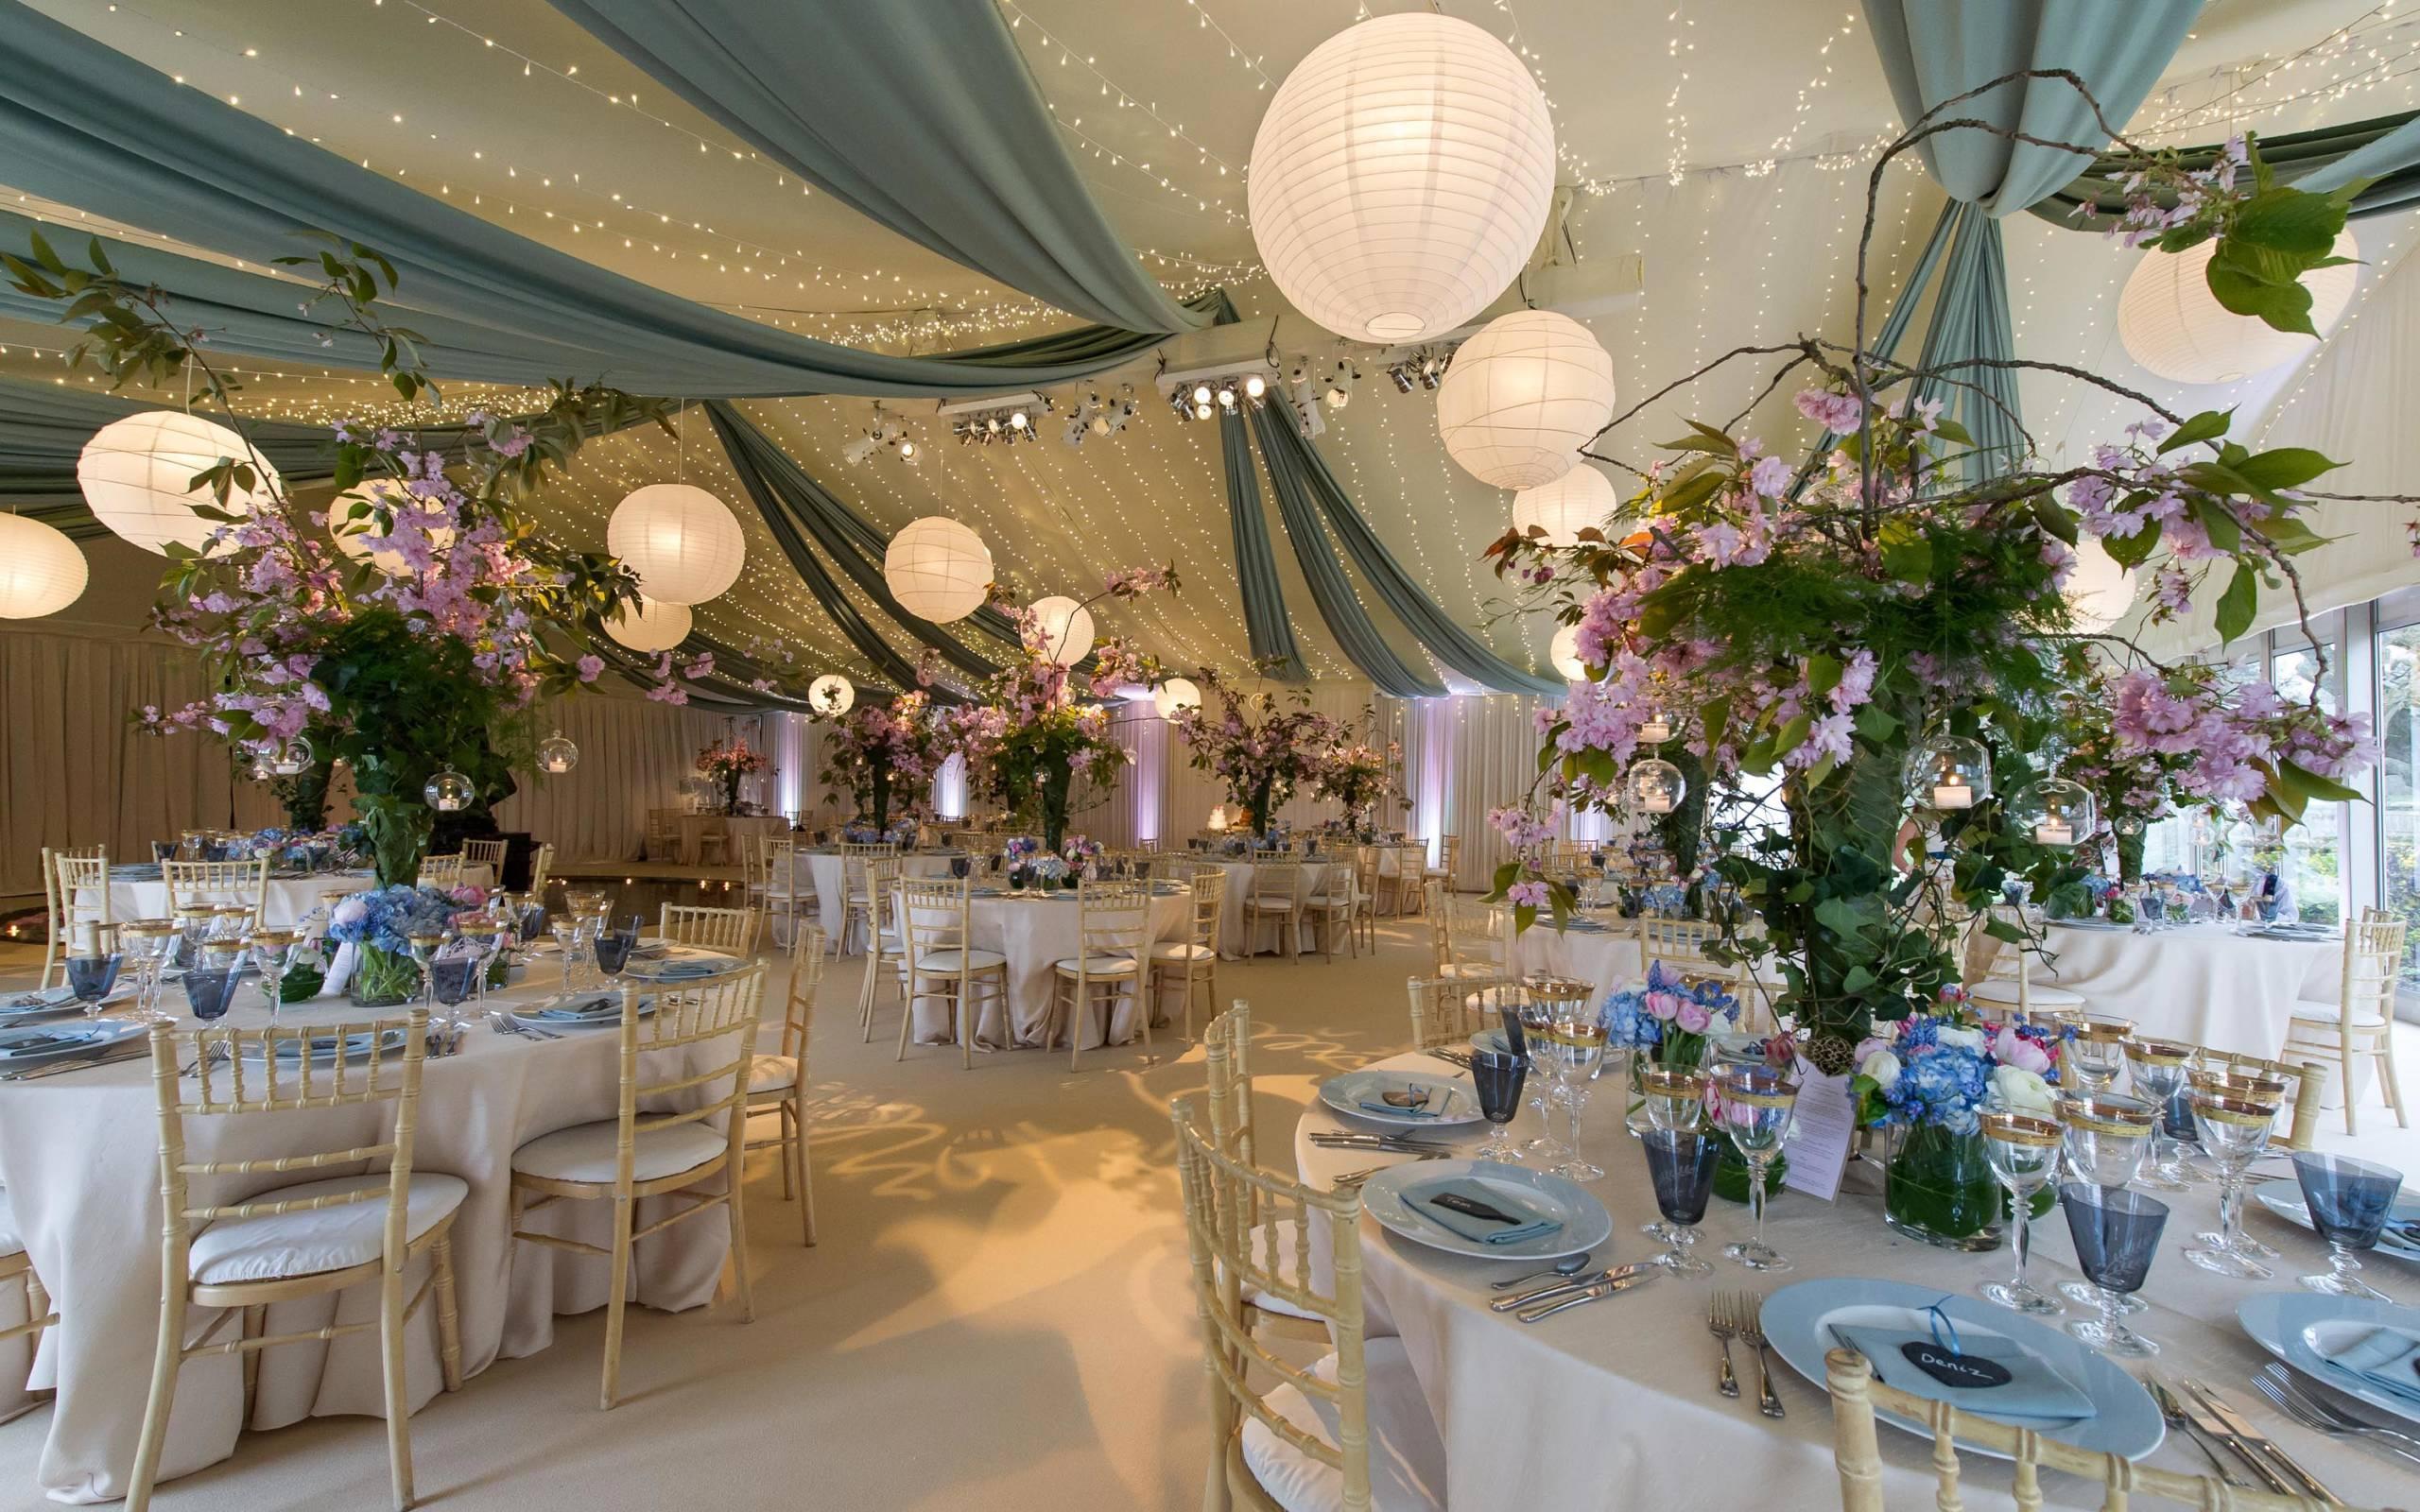 weddings-dairy-marquee-main-image-3000-1875